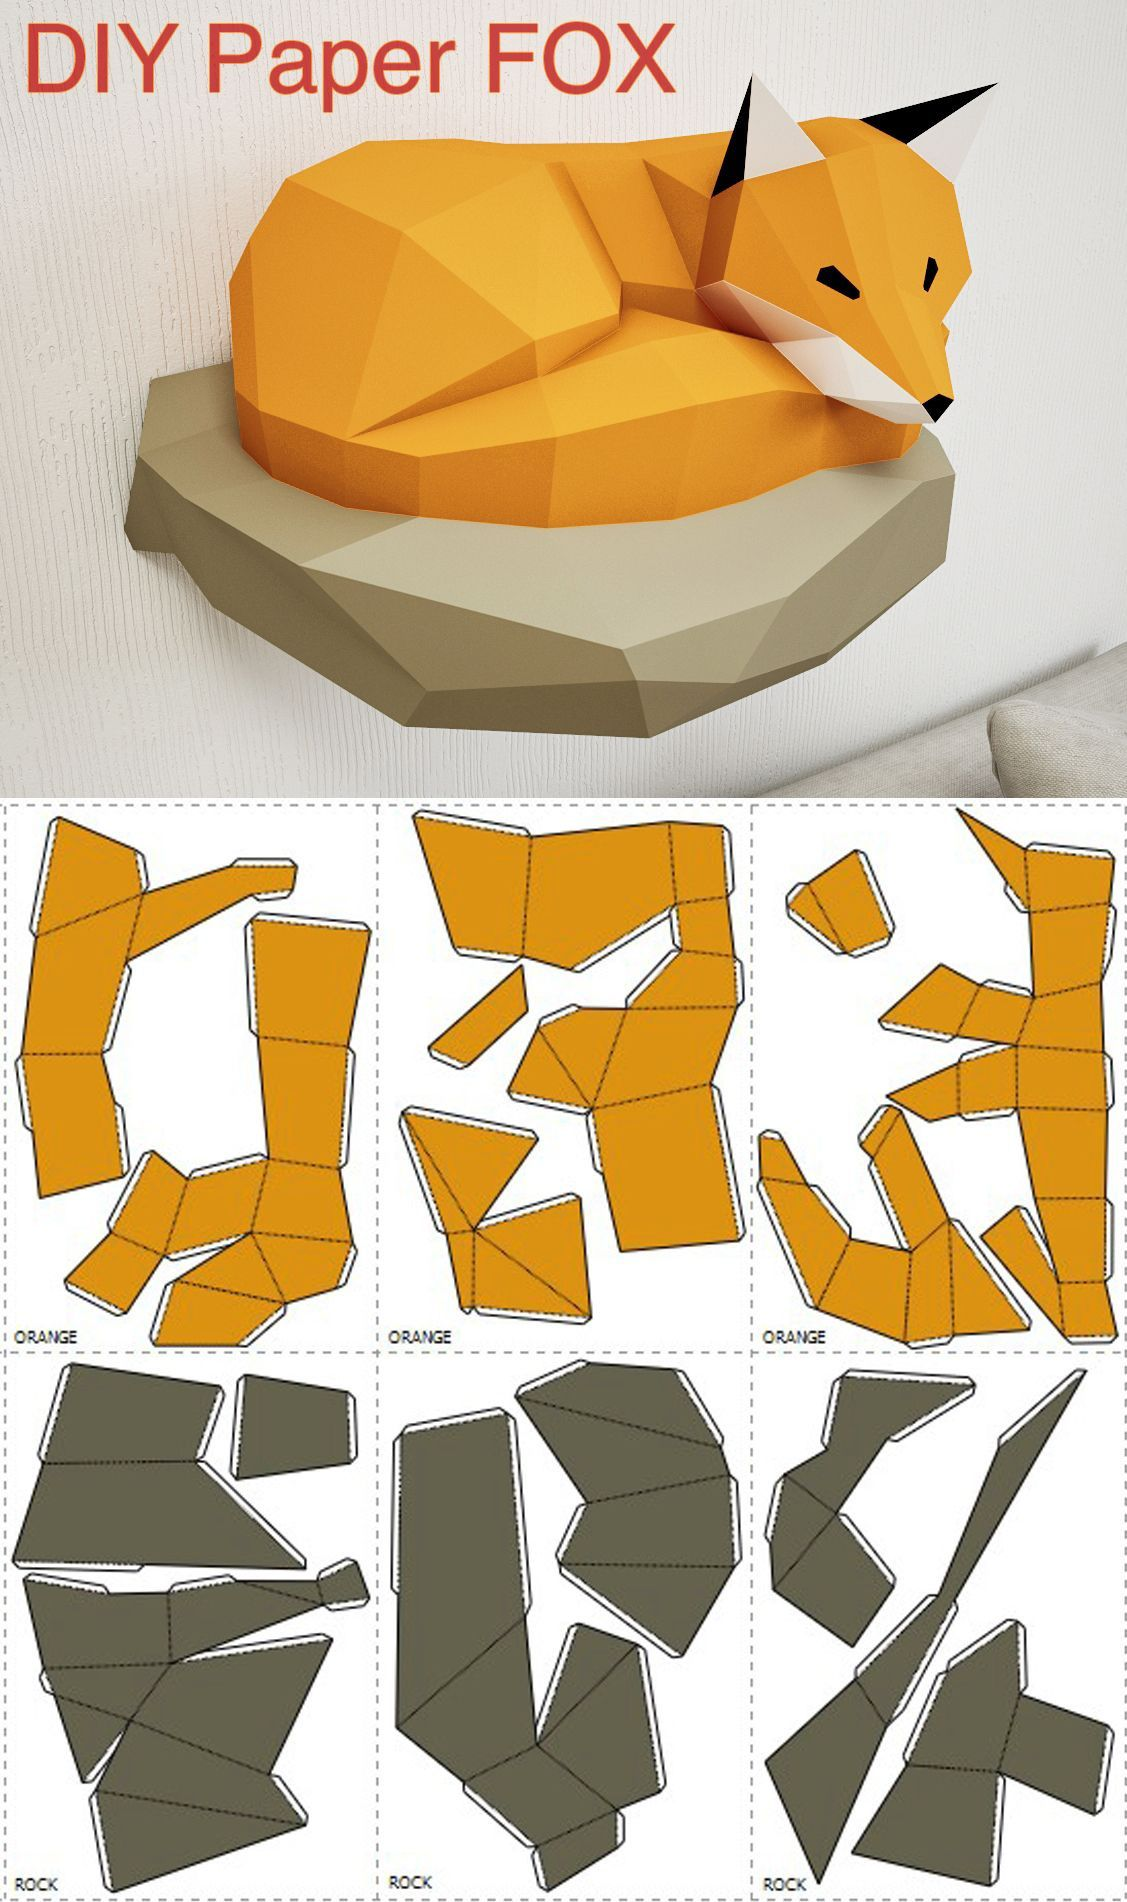 005 Magnificent 3d Paper Art Template Picture  Templates PdfFull